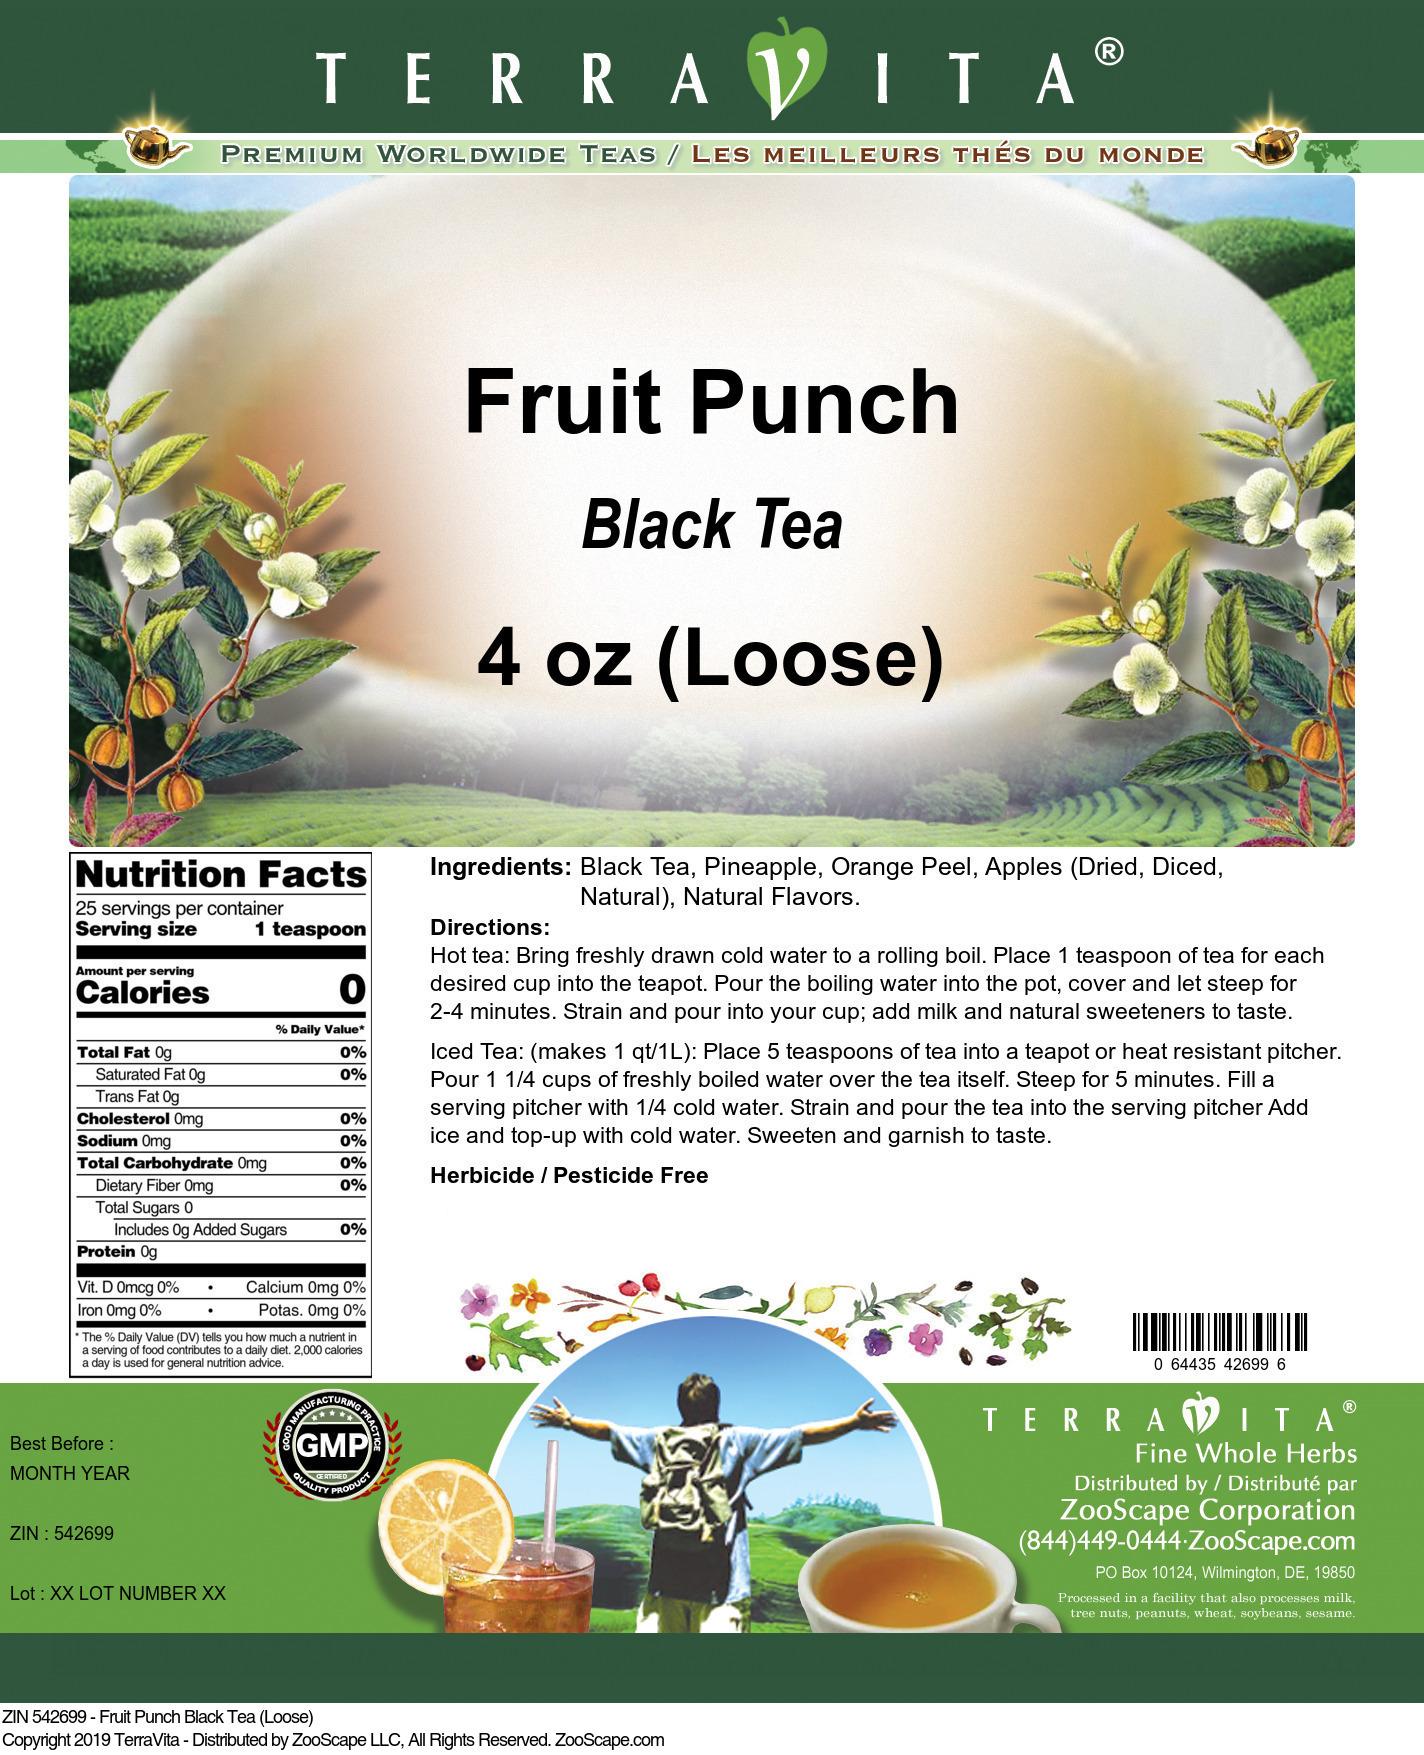 Fruit Punch Black Tea (Loose)